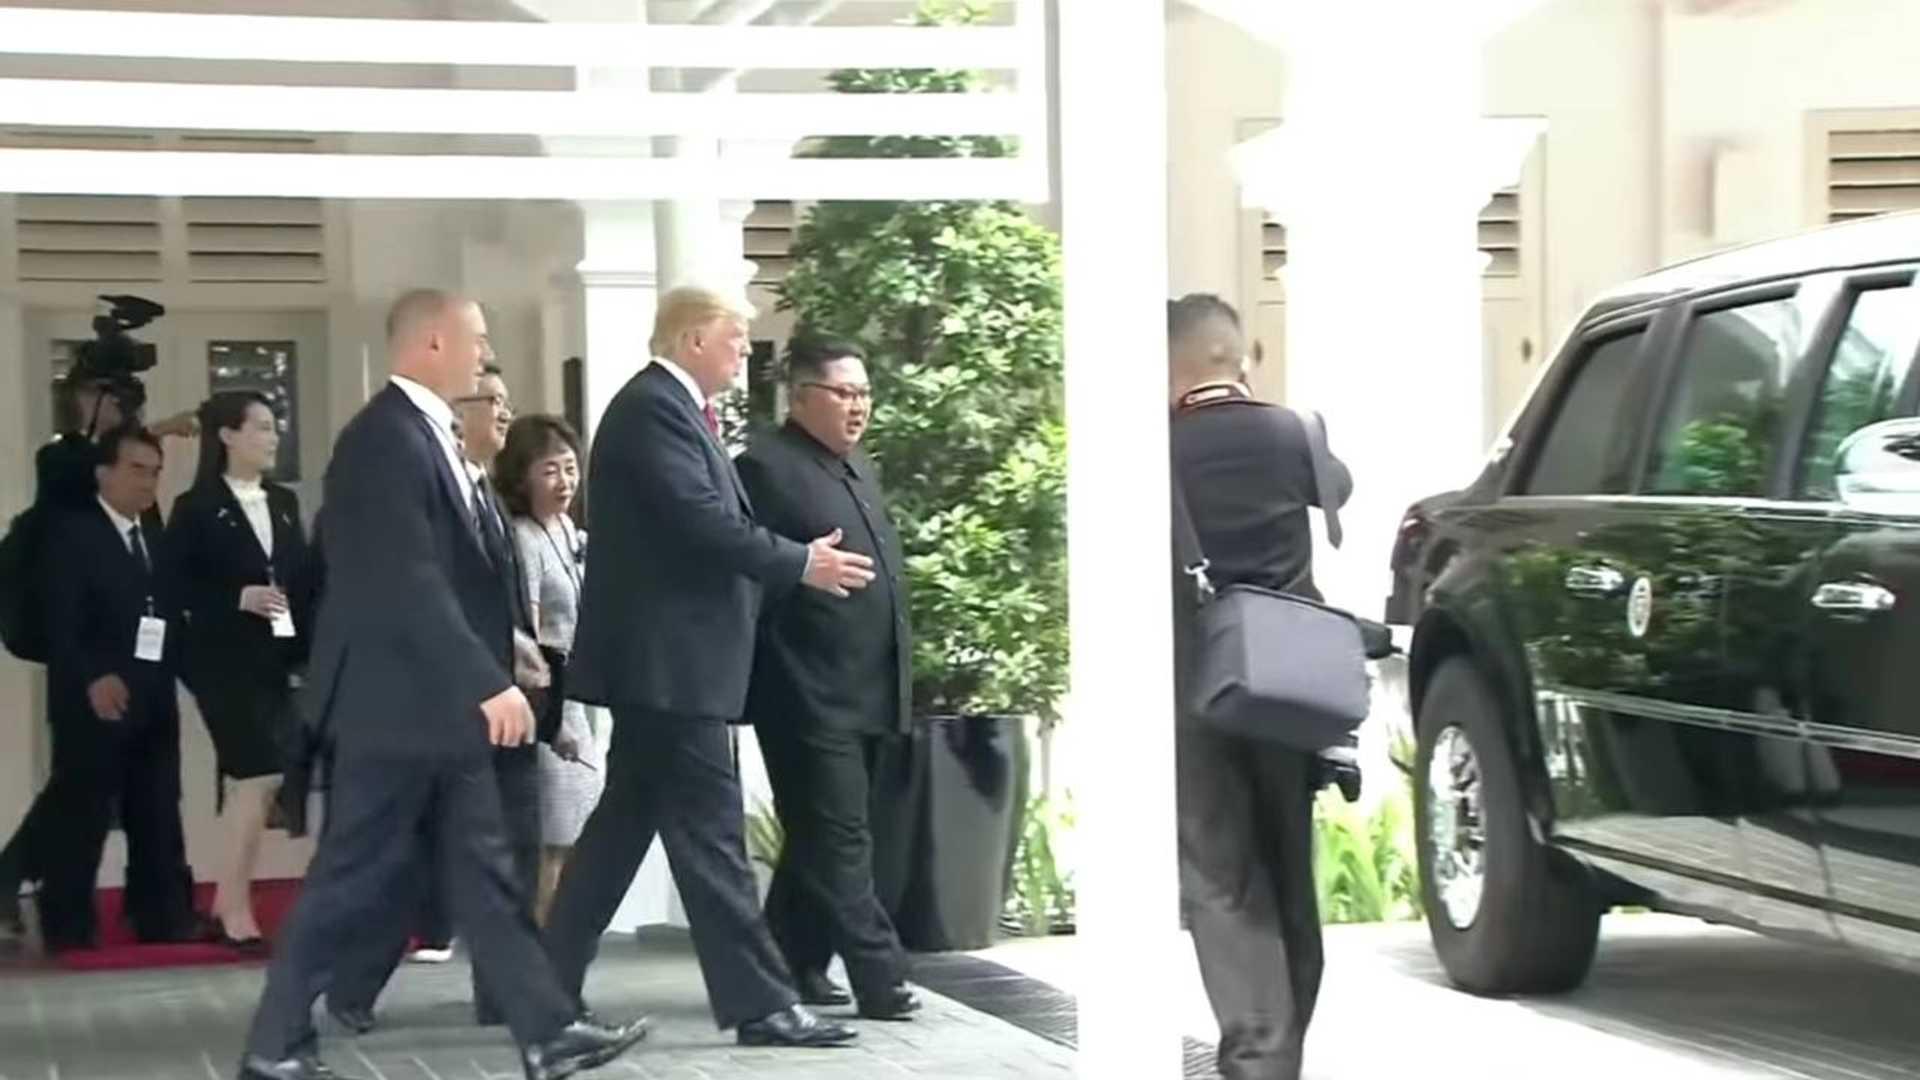 donald-trump-shows-kim-jong-un-the-beast